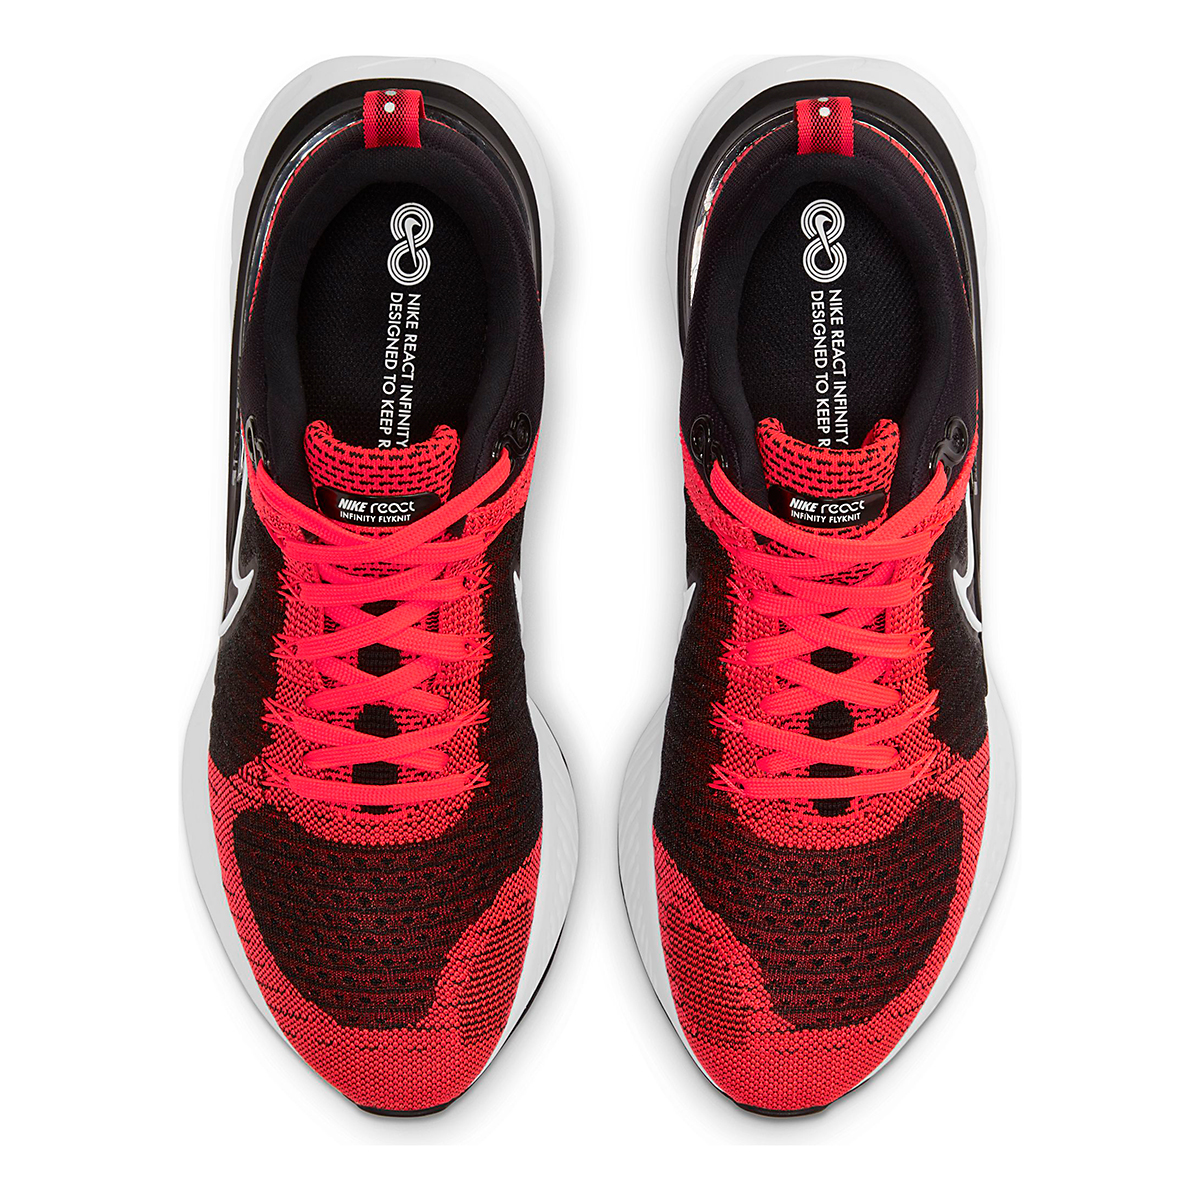 Men's Nike React Infinity Run Flyknit 2 Running Shoe - Color: Bright Crimson/White/Black/Smike Grey - Size: 6 - Width: Regular, Bright Crimson/White/Black/Smike Grey, large, image 5